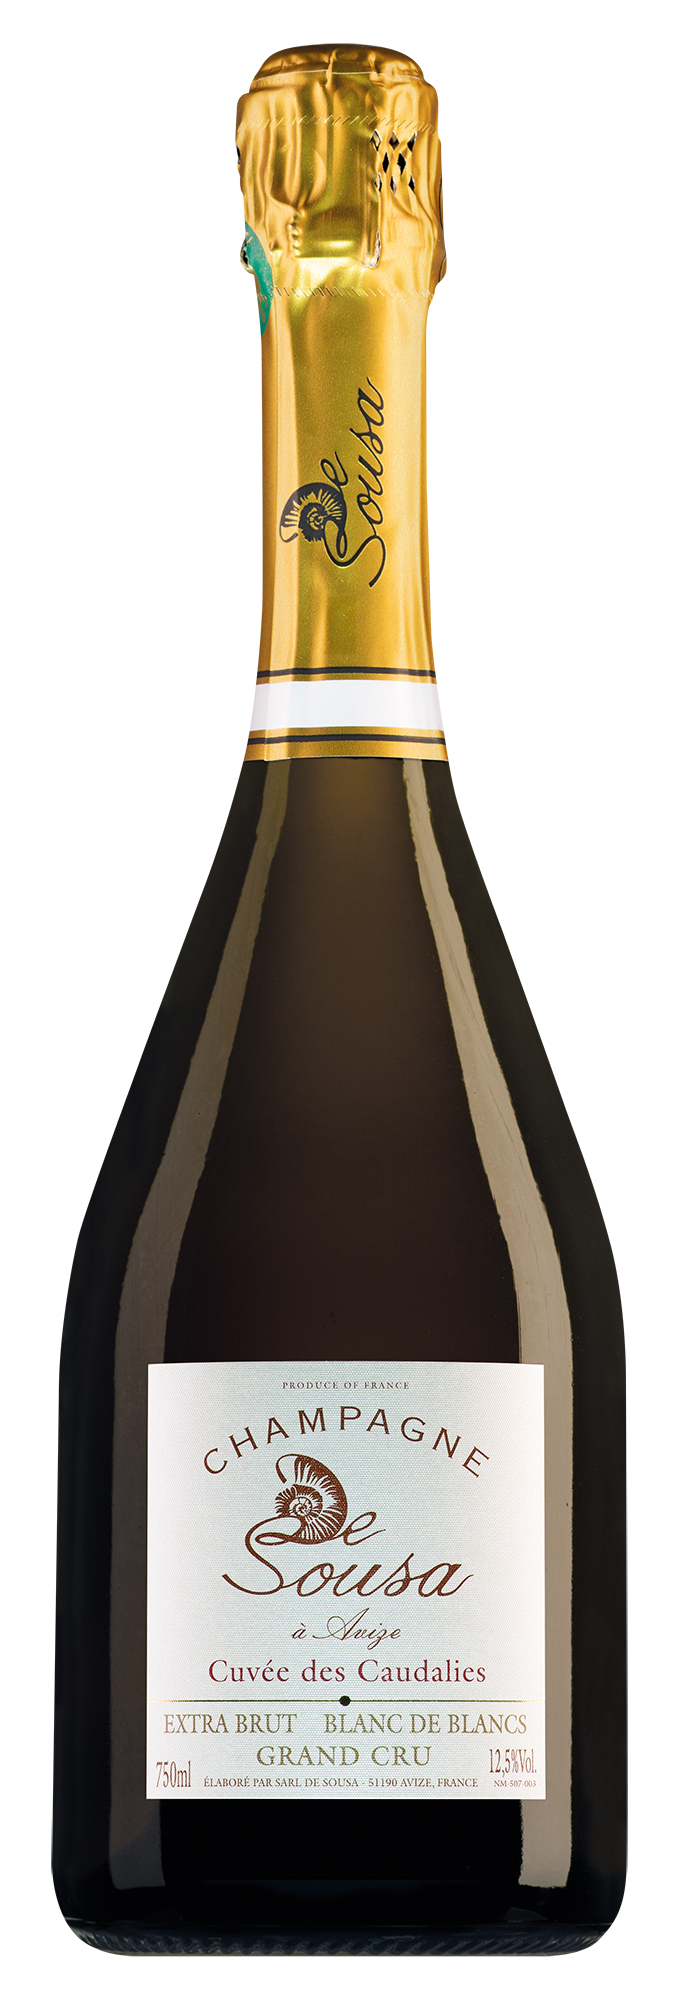 De Sousa Champagne Grand Cru Cuvée des Caudalies Extra Brut